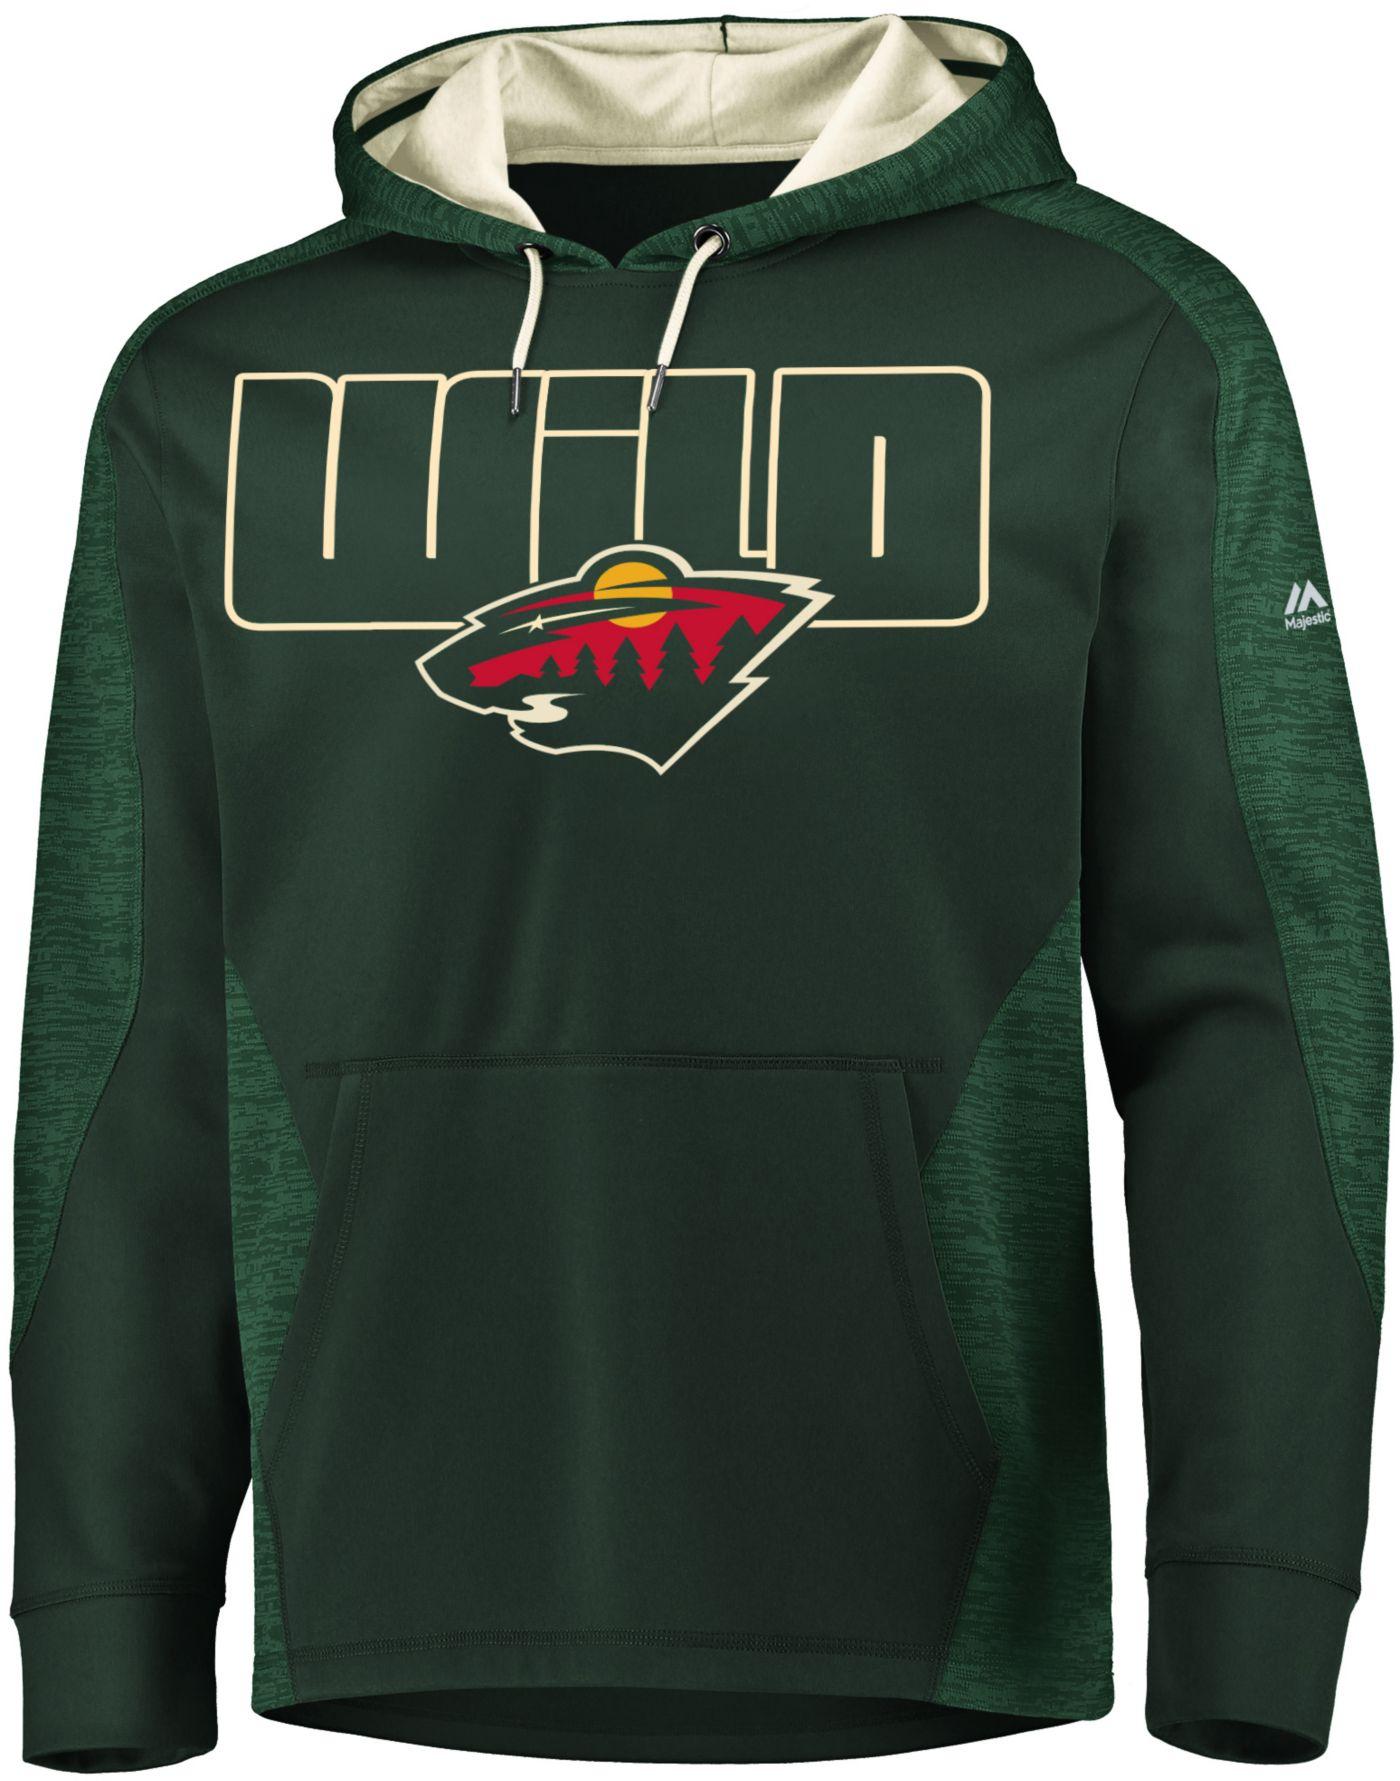 Majestic Men's Minnesota Wild Armor Green Hoodie